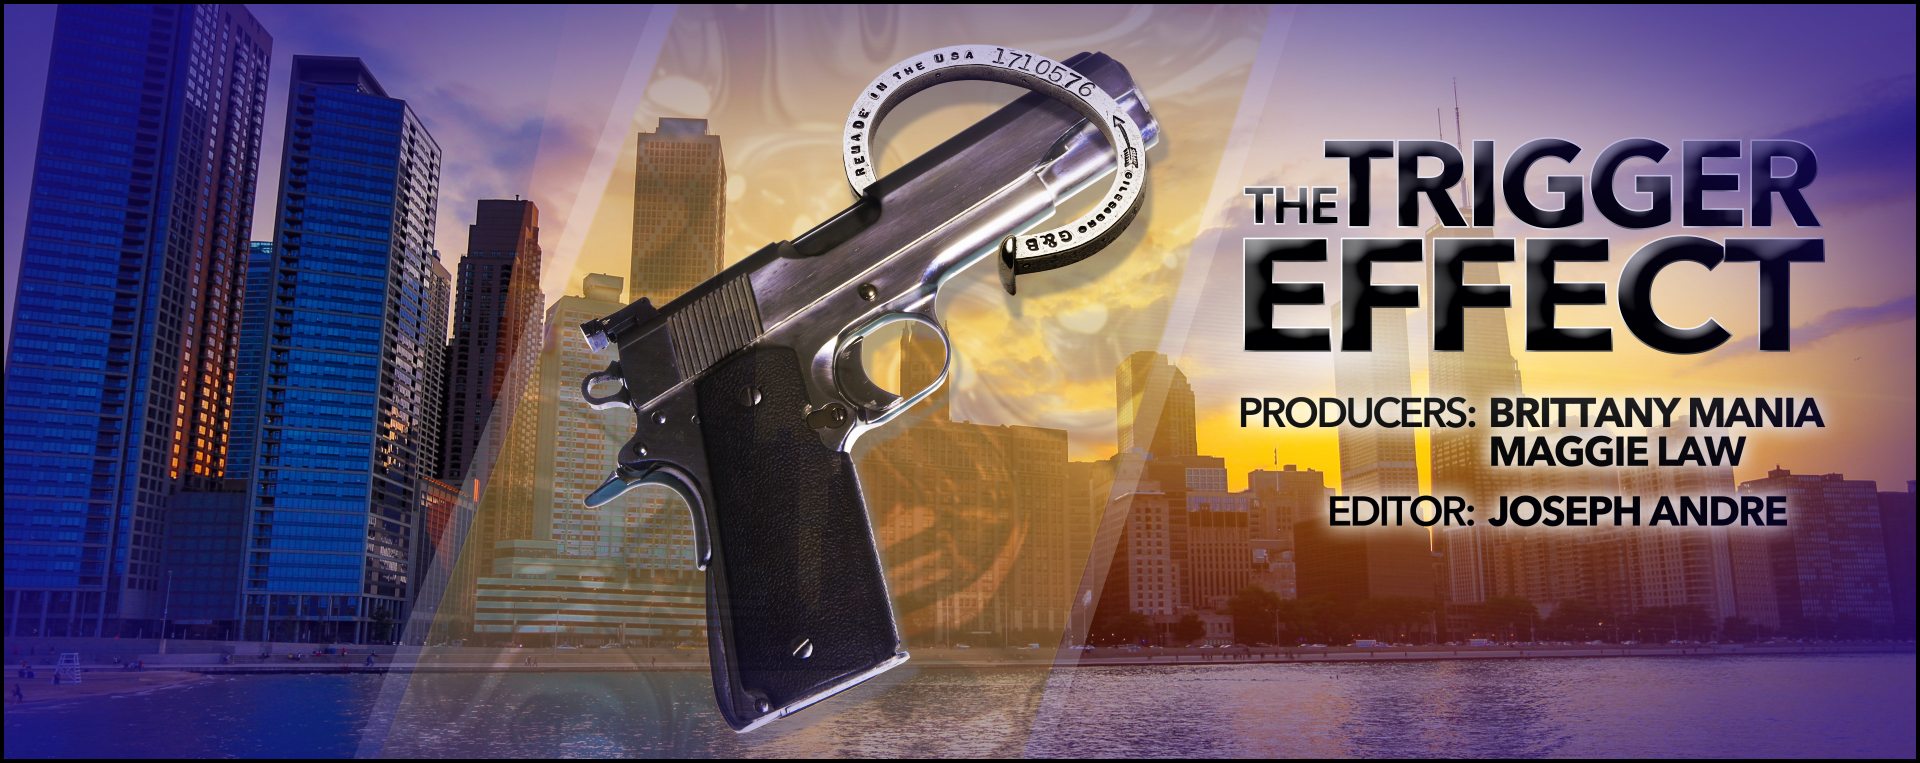 GUNS-TO-JEWELRY-CLOSER.jpg